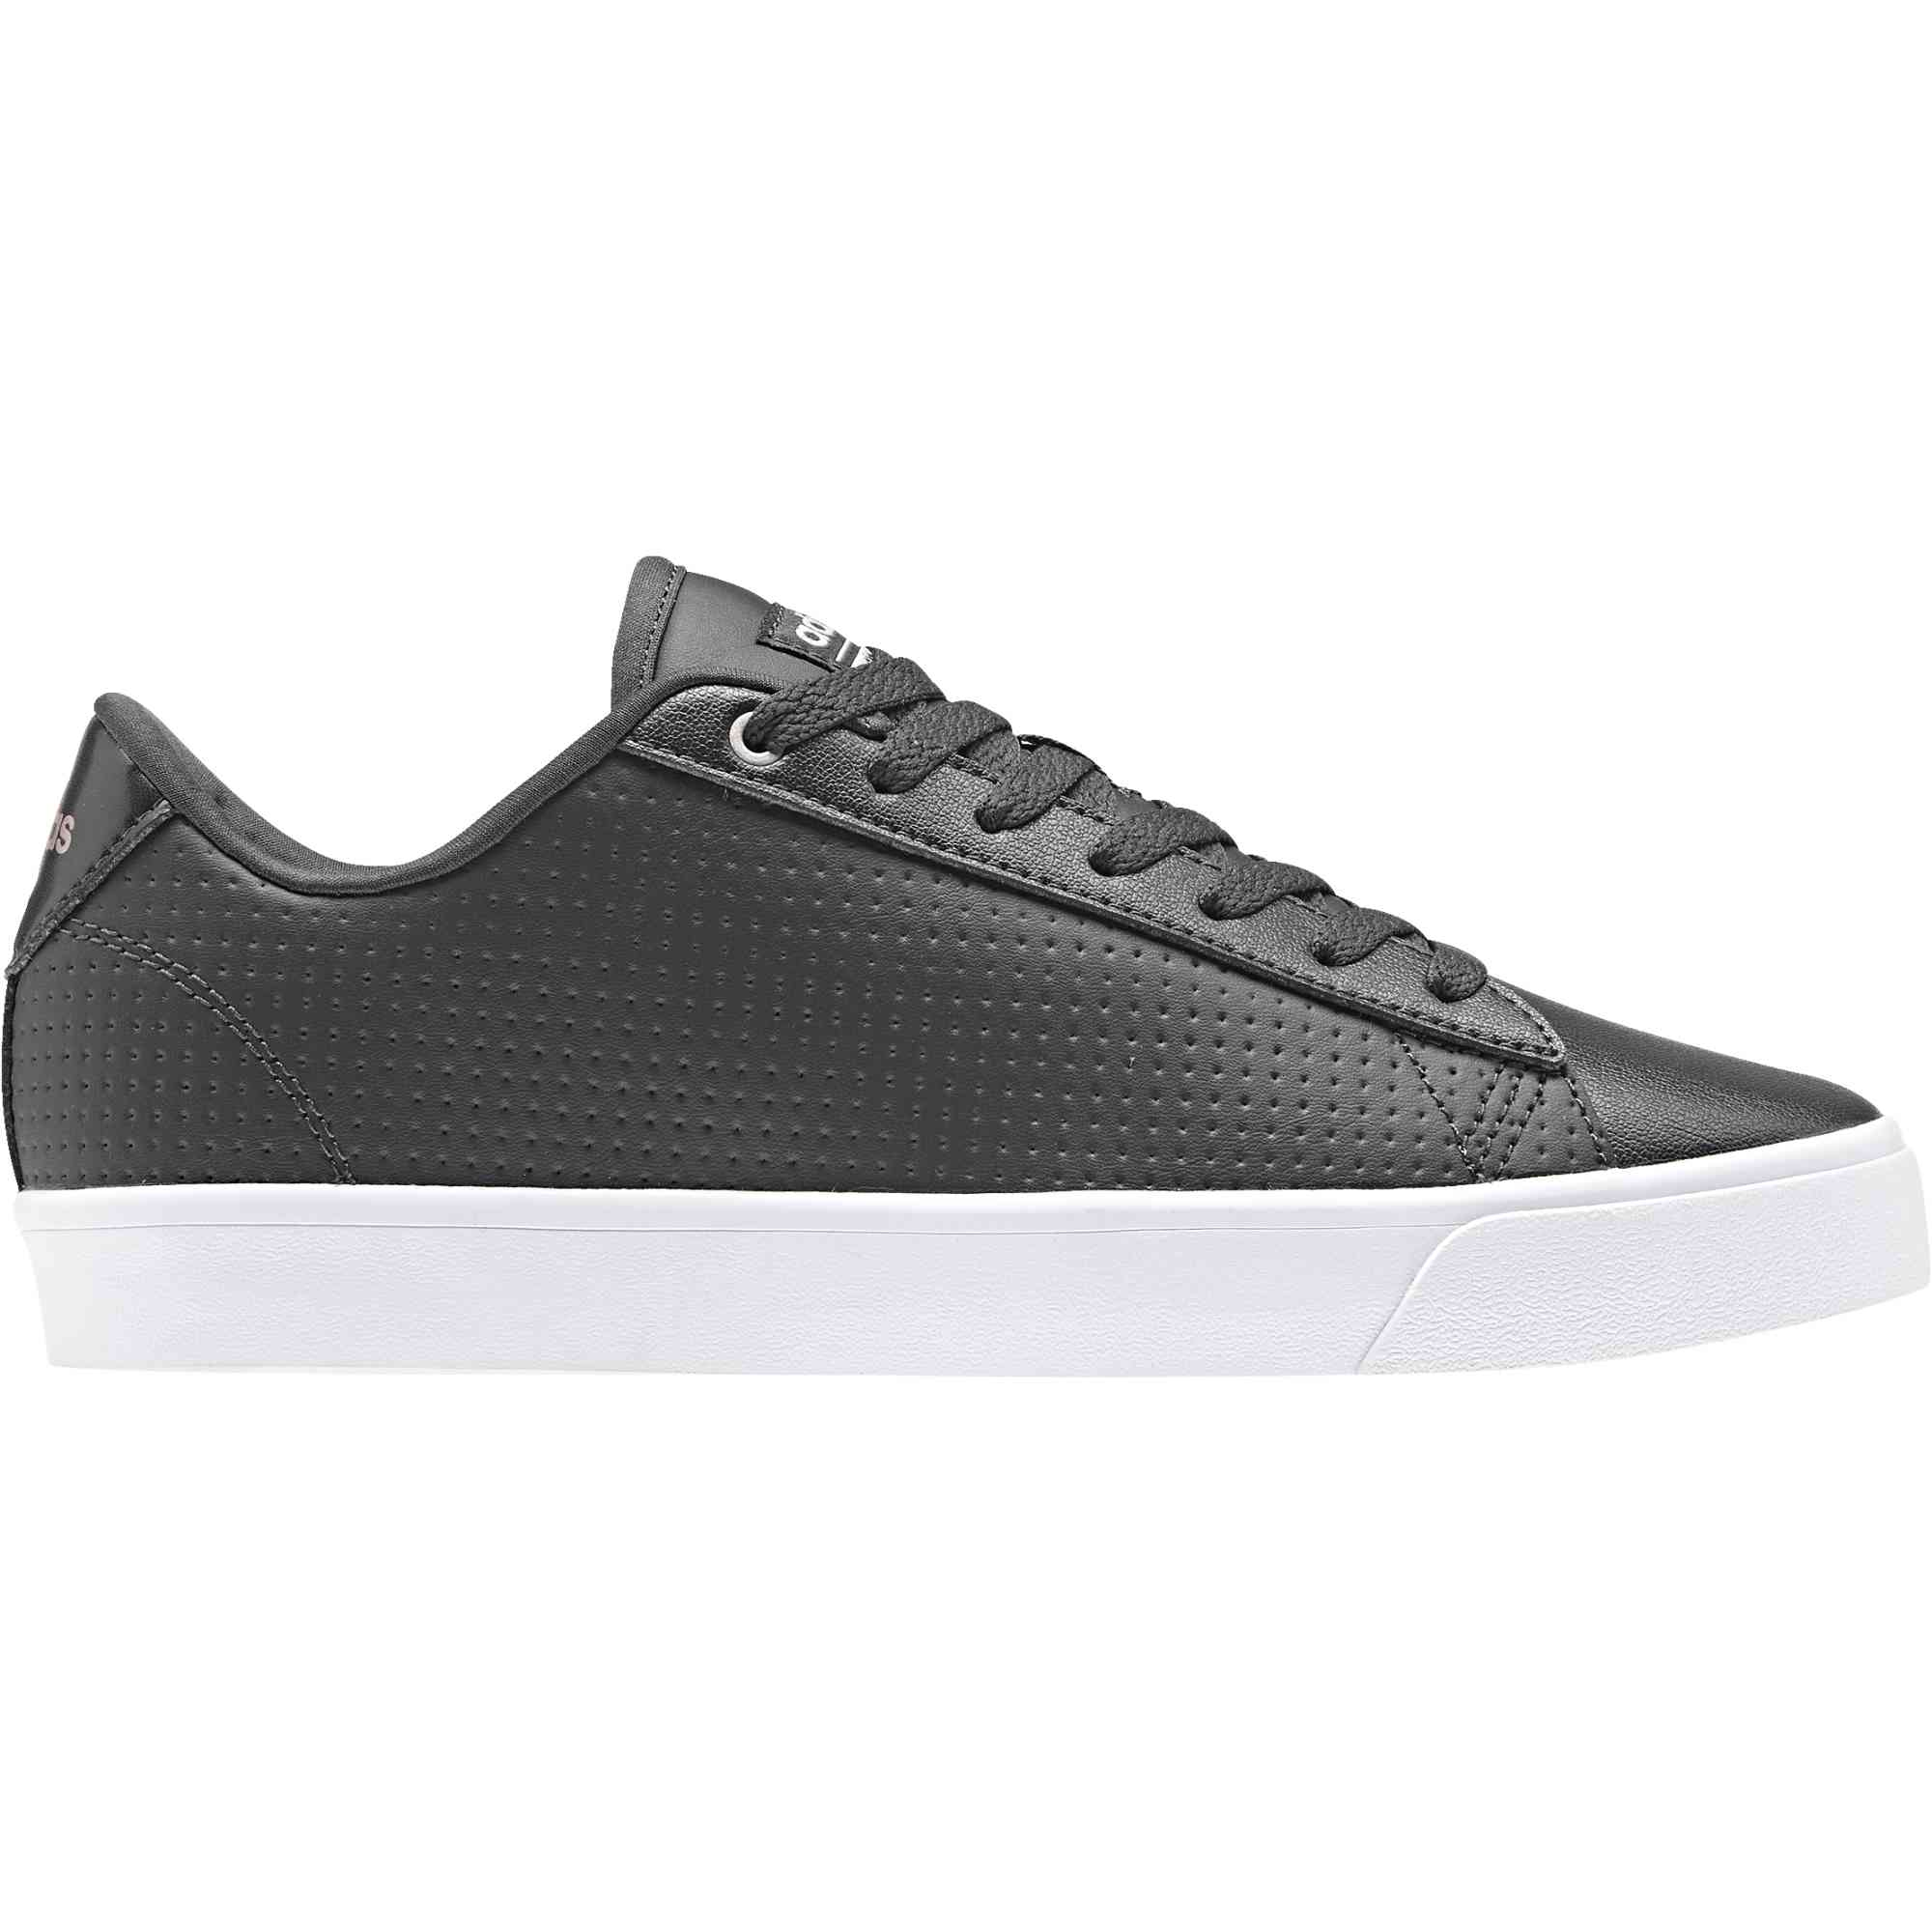 Adidas Cloud Foam Daily Dames sneakers